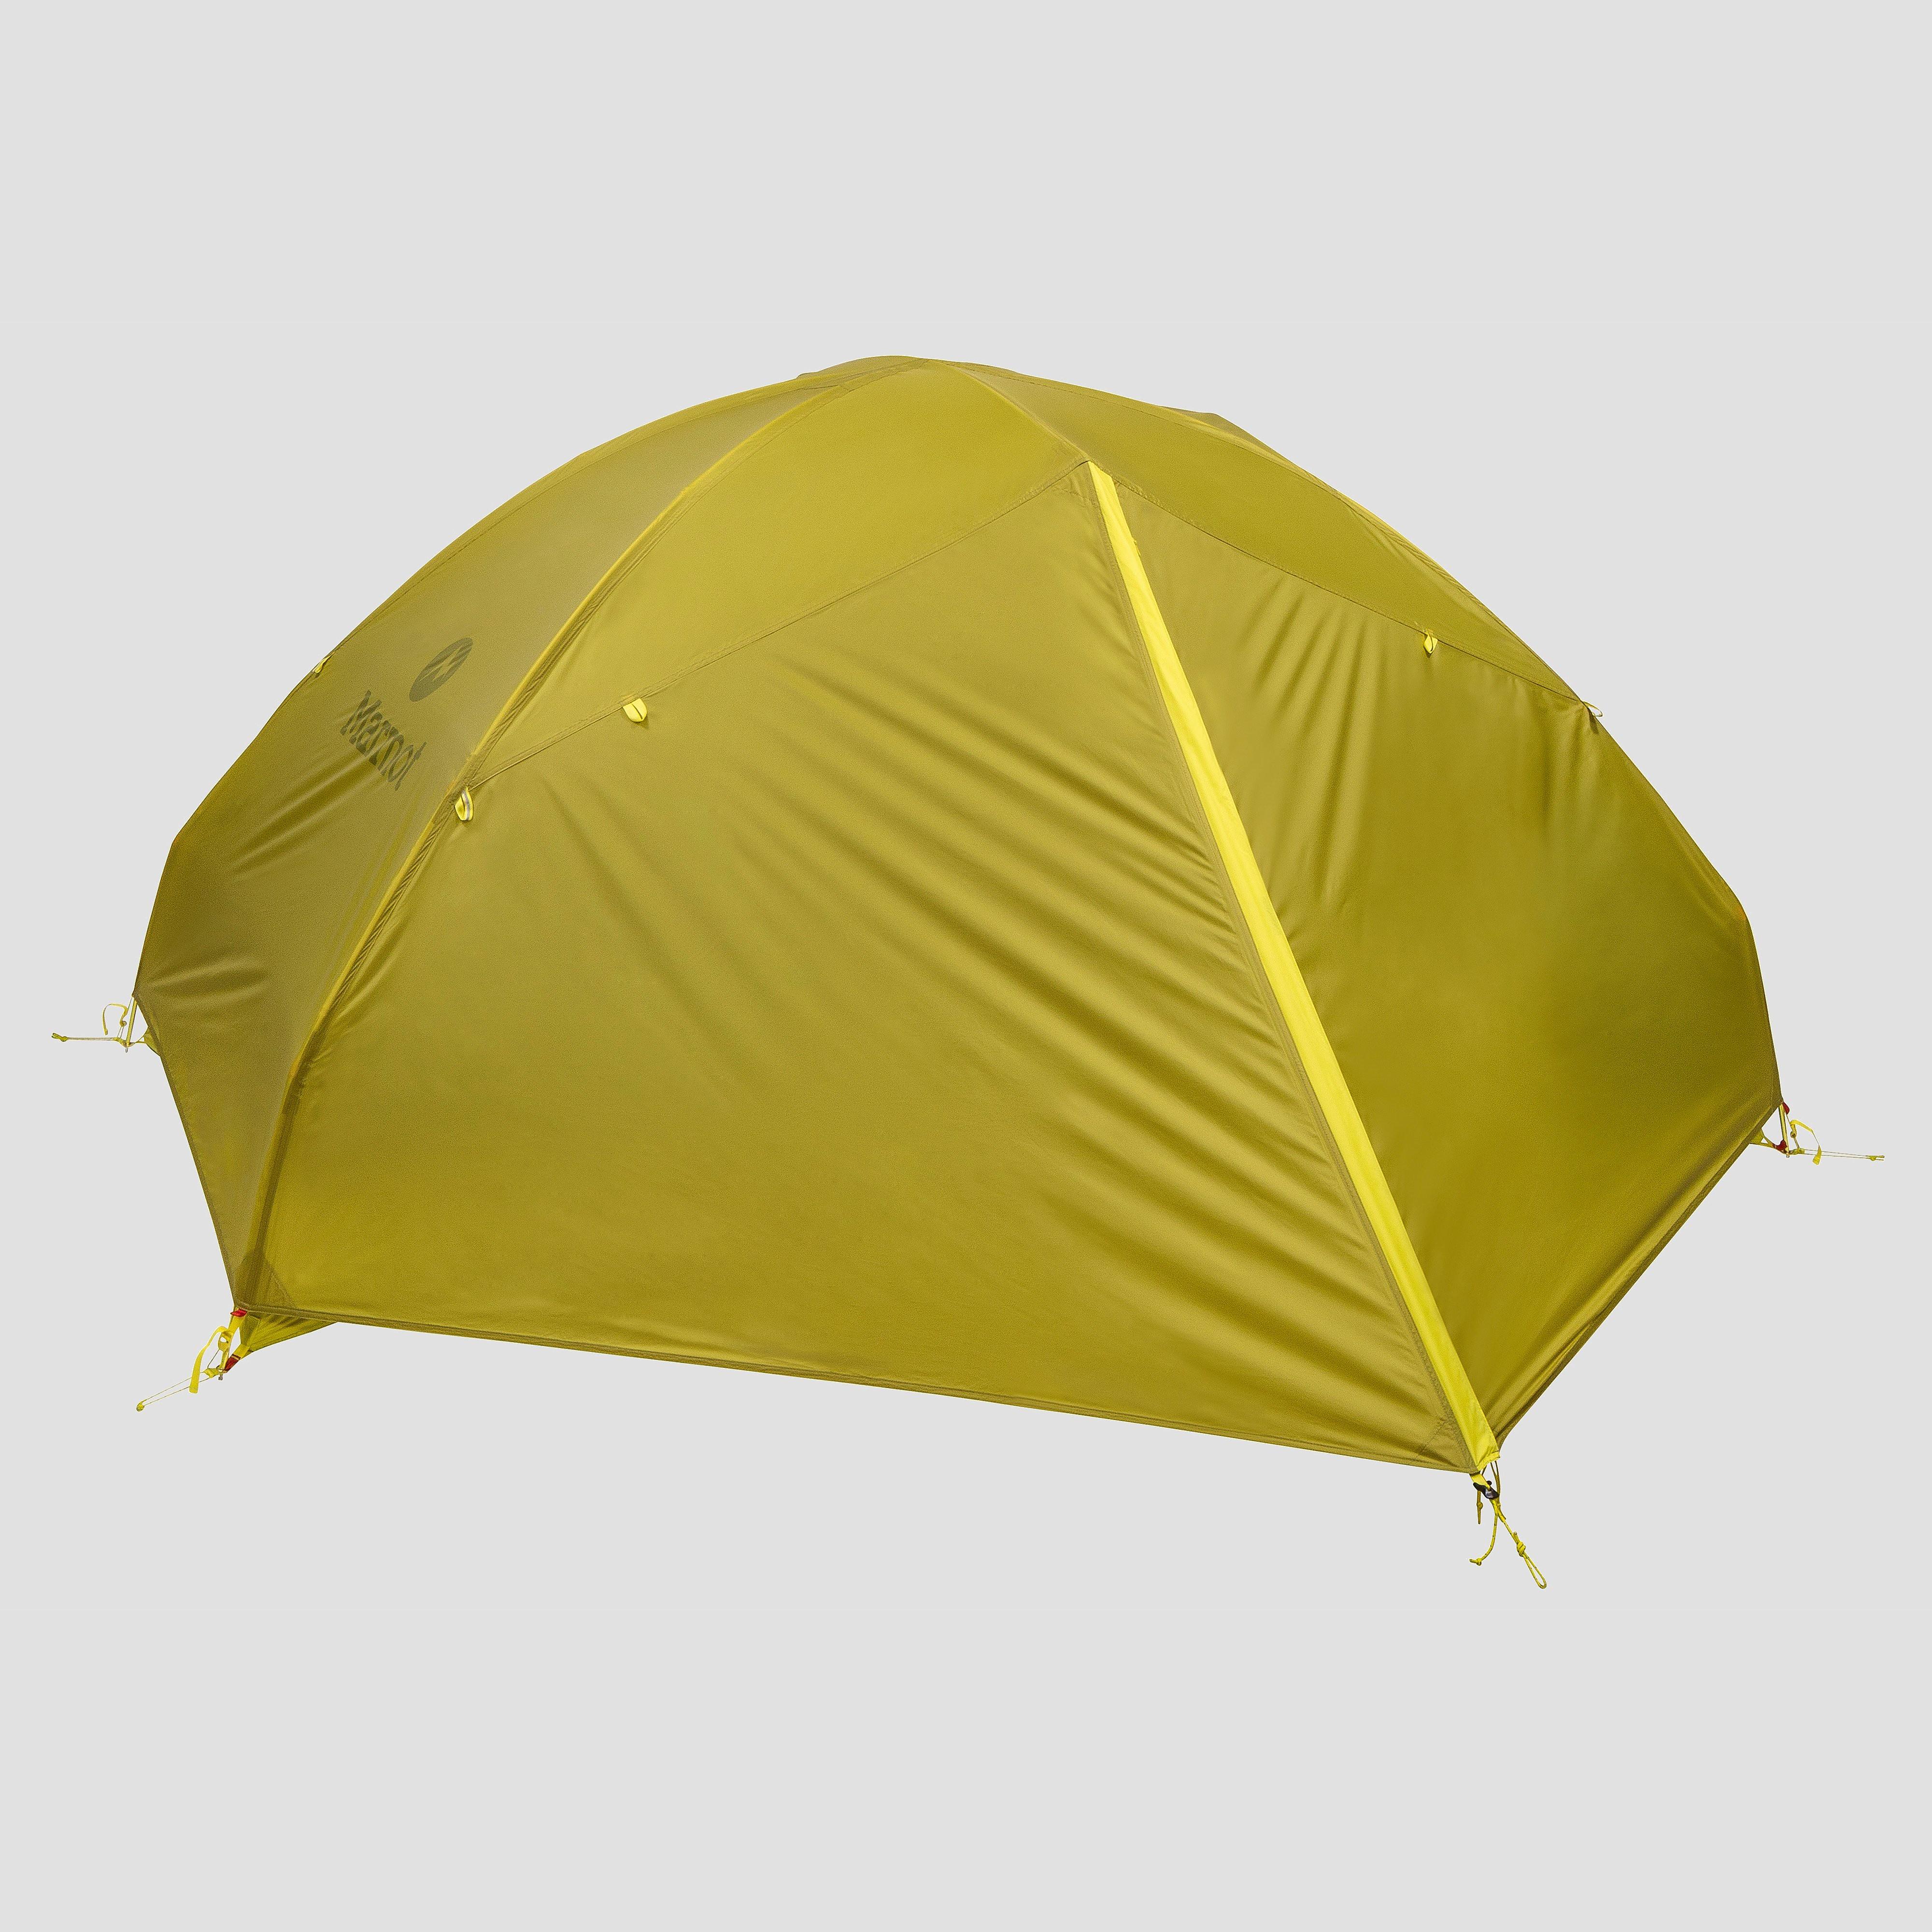 Marmot Tungsten 2 Man Tent